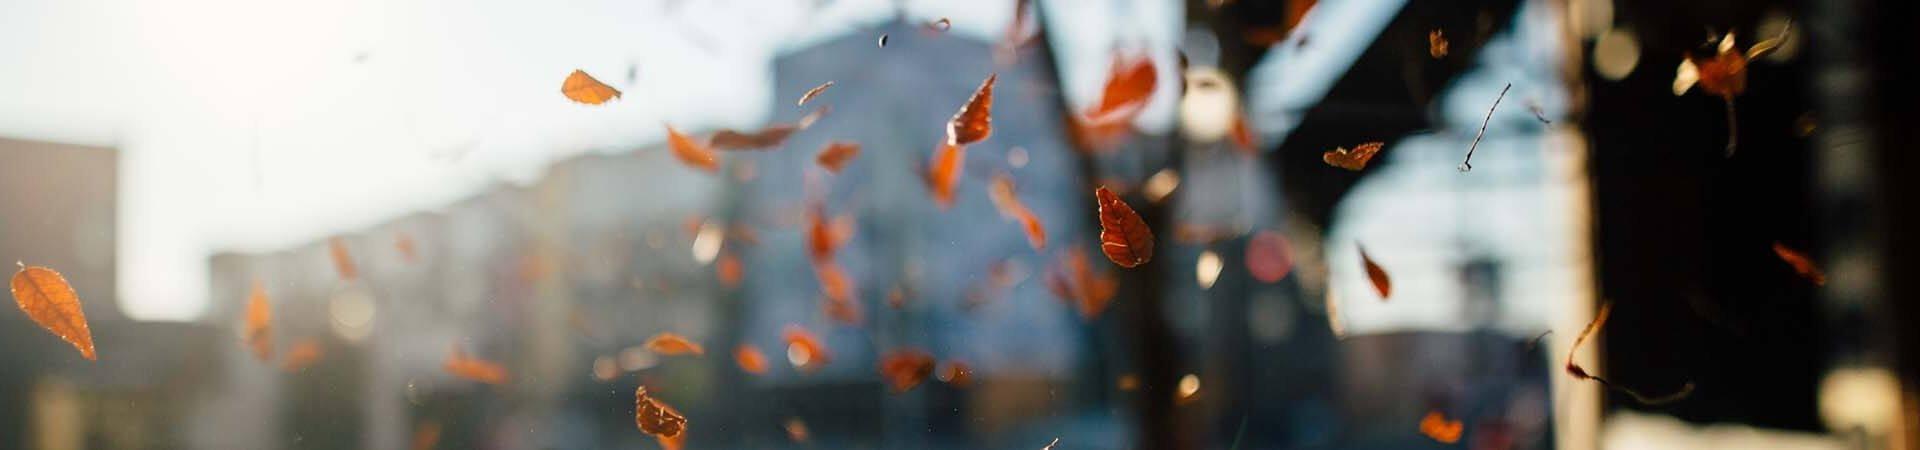 sca-strata-community-living-autumn-2018